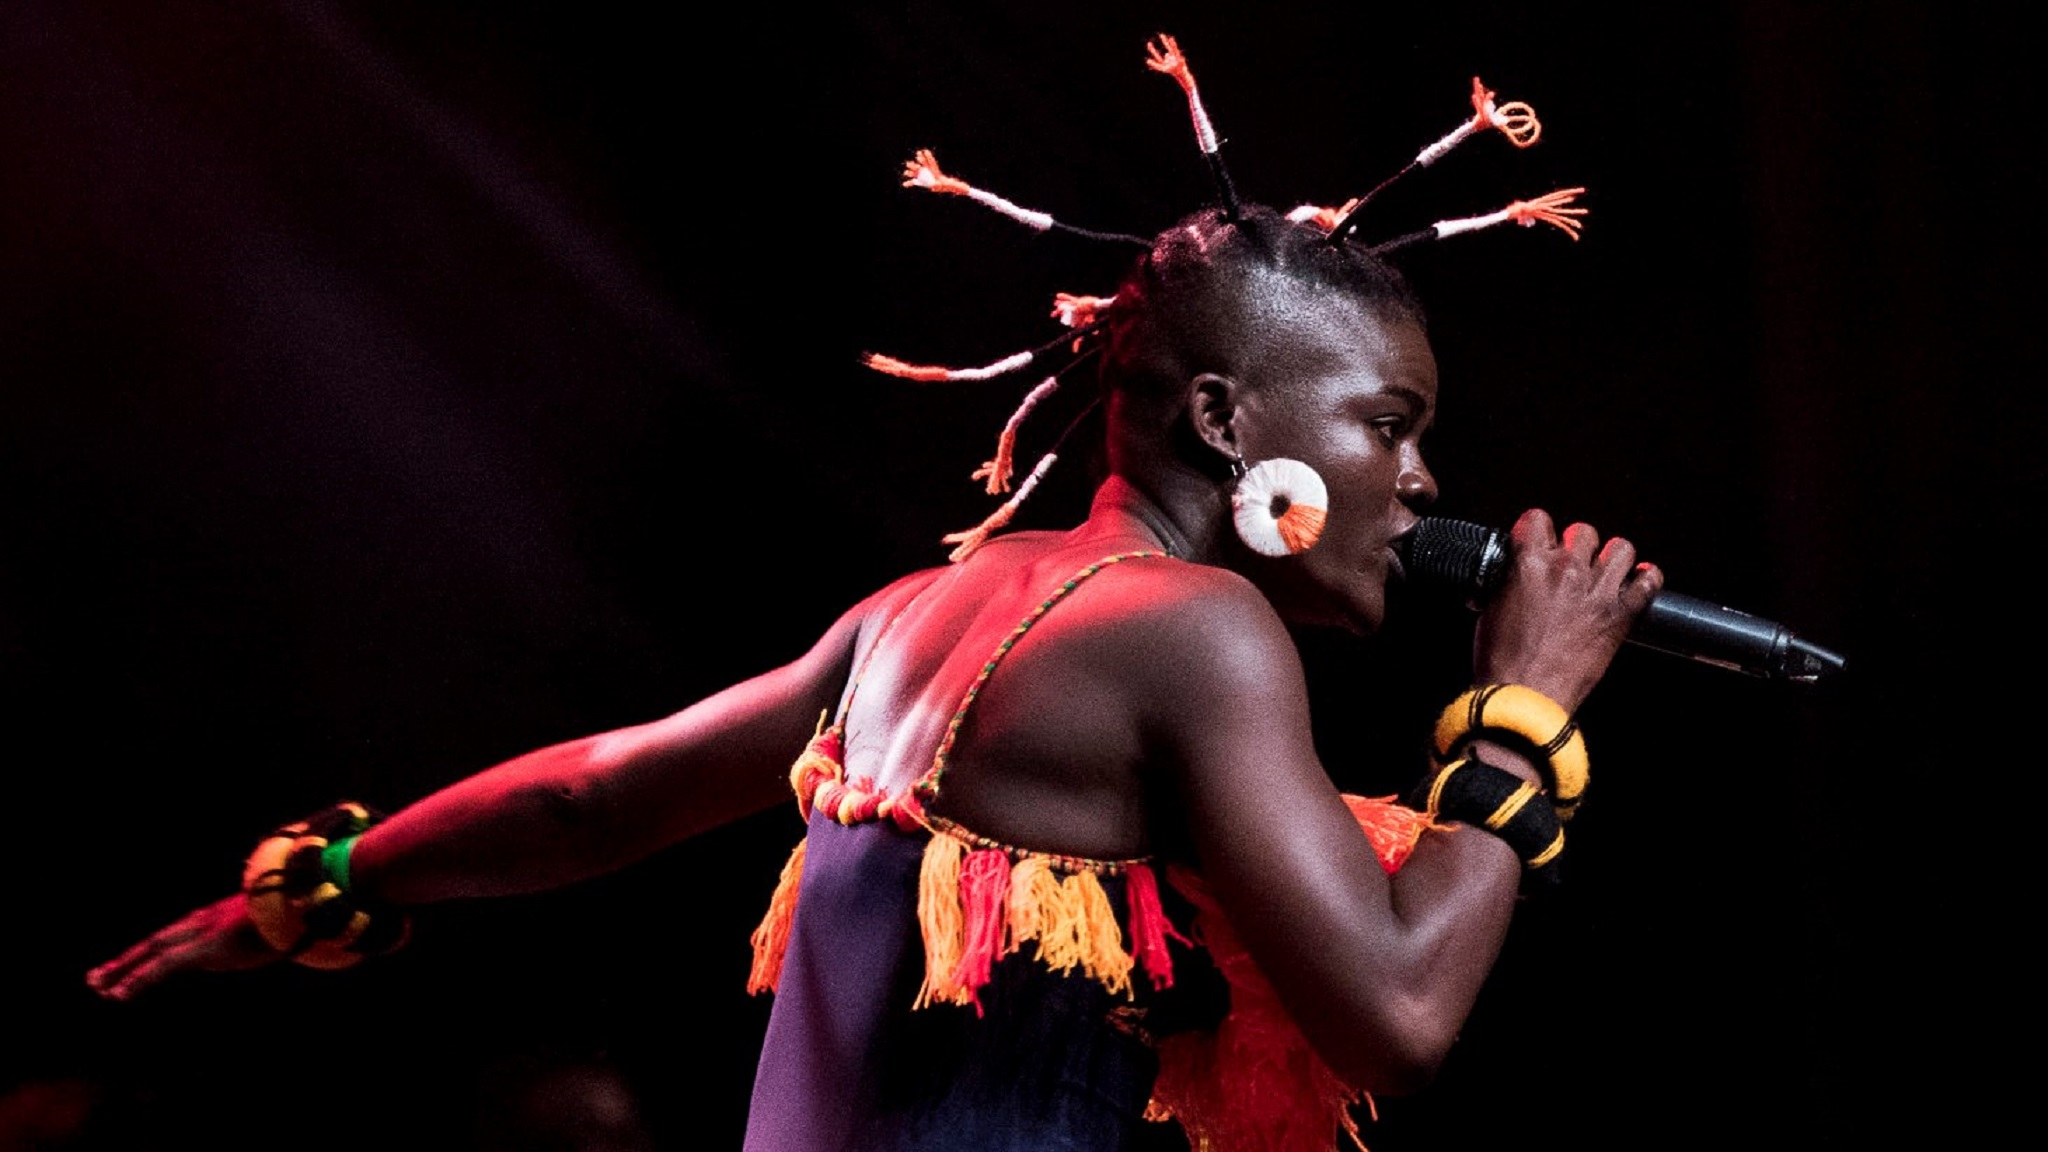 Wiyaala The Afropop Star Defying Ghanaian Norms Financial Times